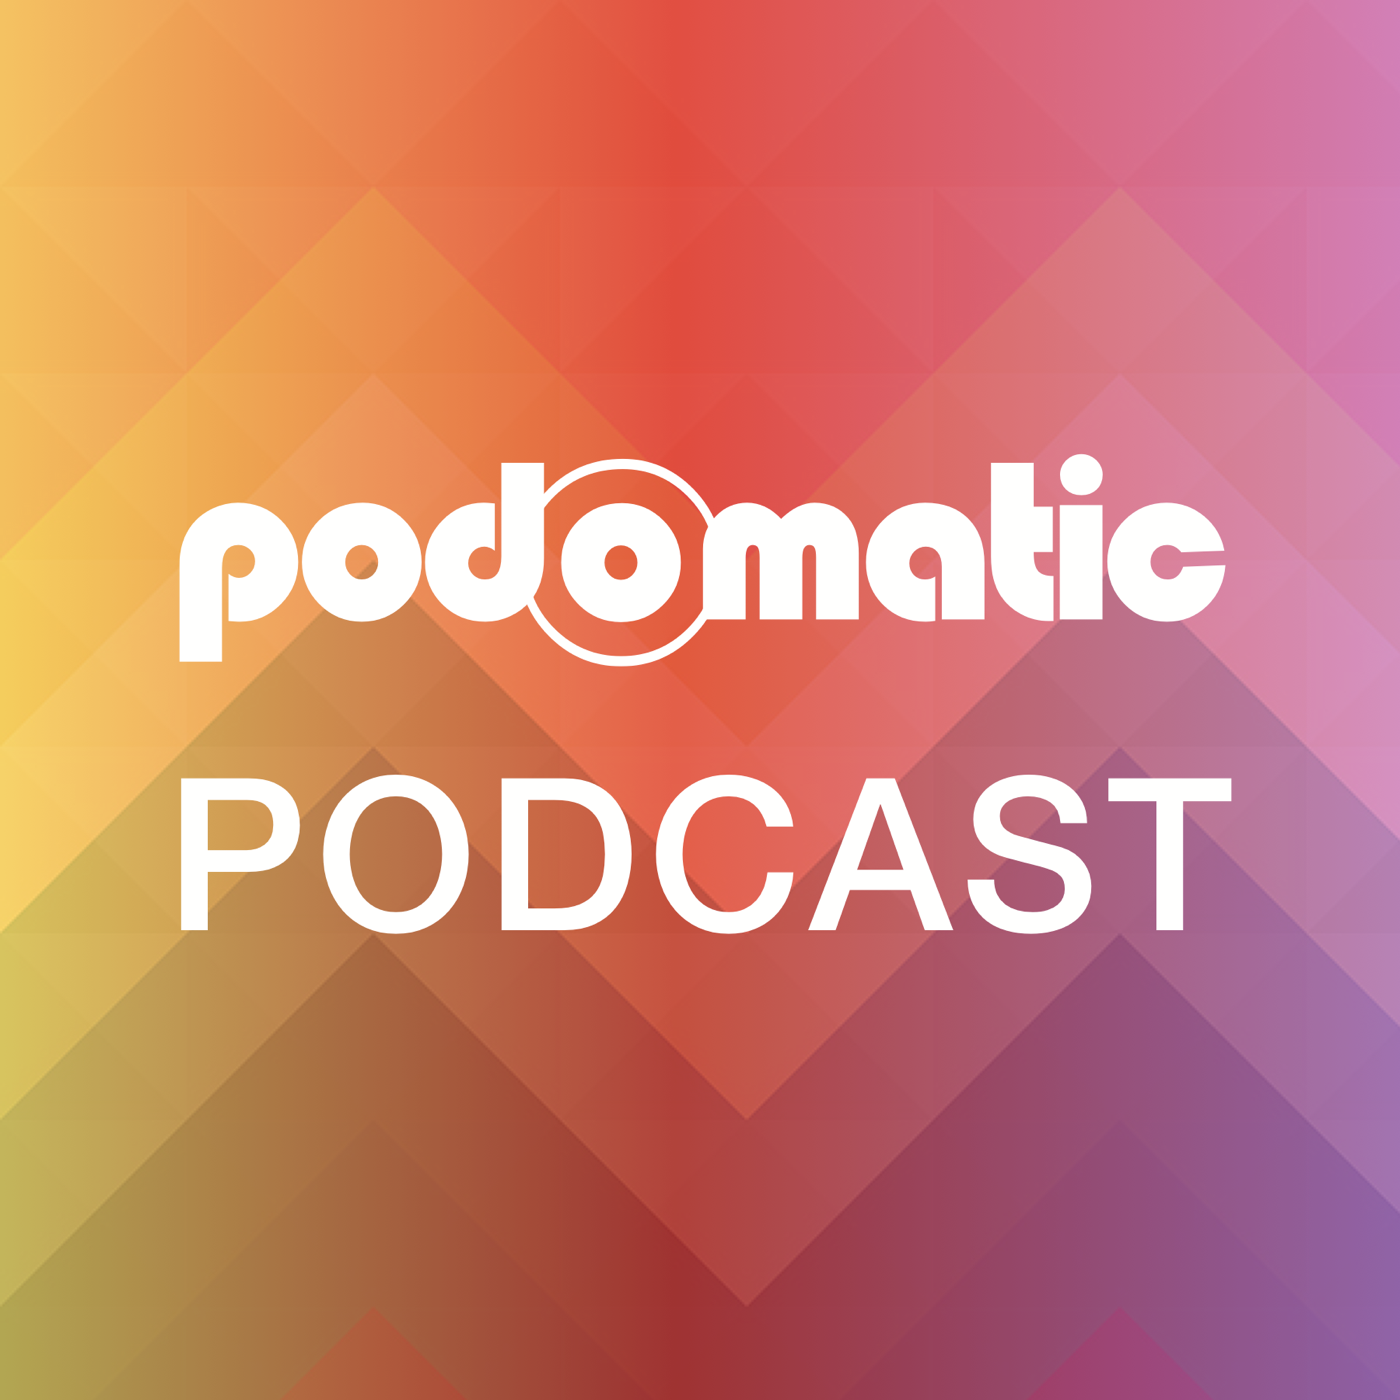 carmix's Podcast